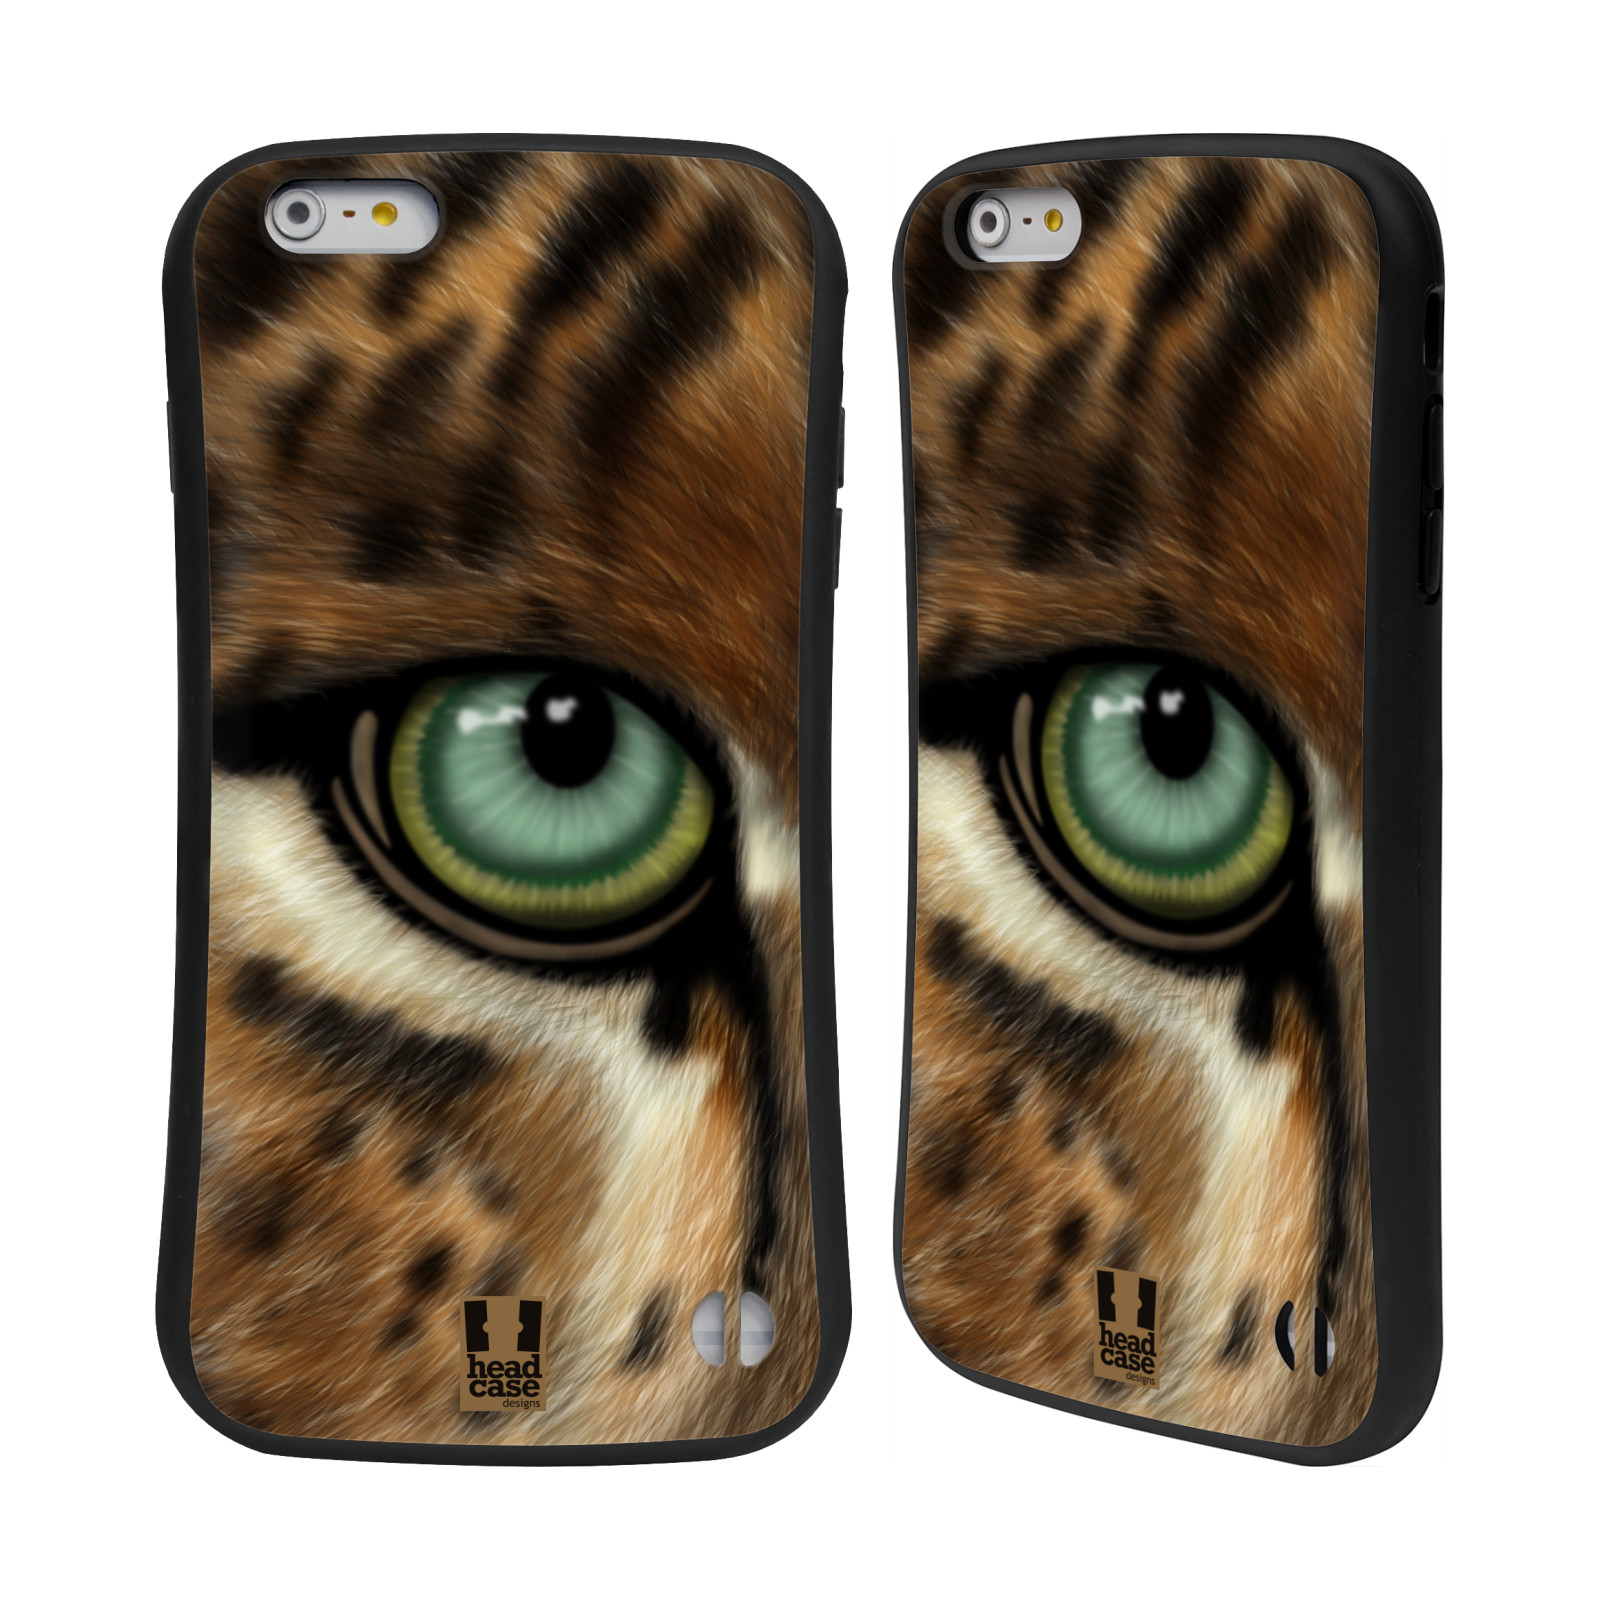 HEAD CASE silikon/plast odolný obal na mobil Apple Iphone 6 PLUS / 6S PLUS vzor pohled zvířete oko leopard